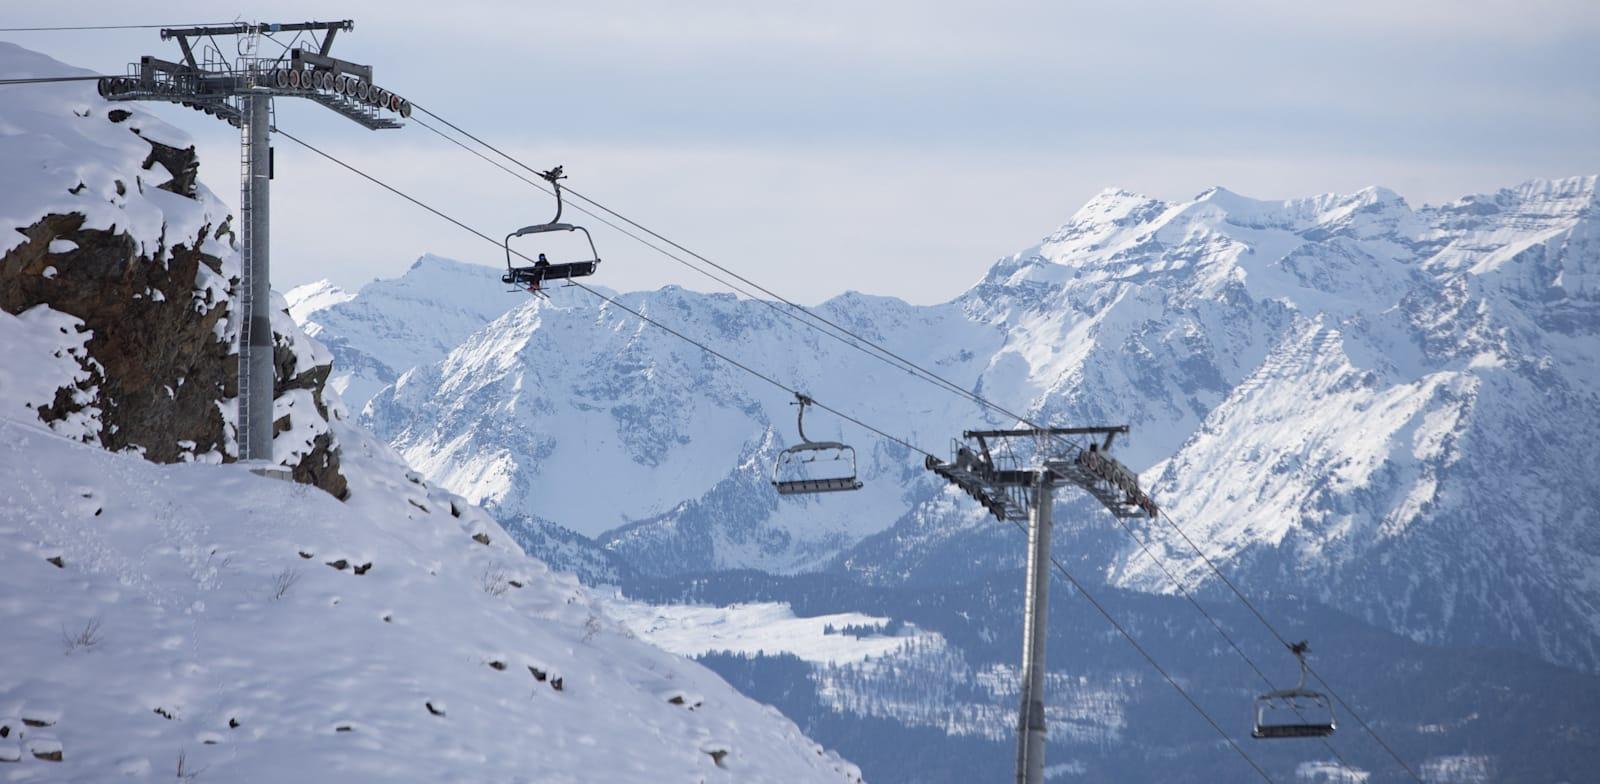 אתר הסקי בוורביה, שווייץ / צילום: Reuters, Raphael Lafargue/ABACAPRESS.COM